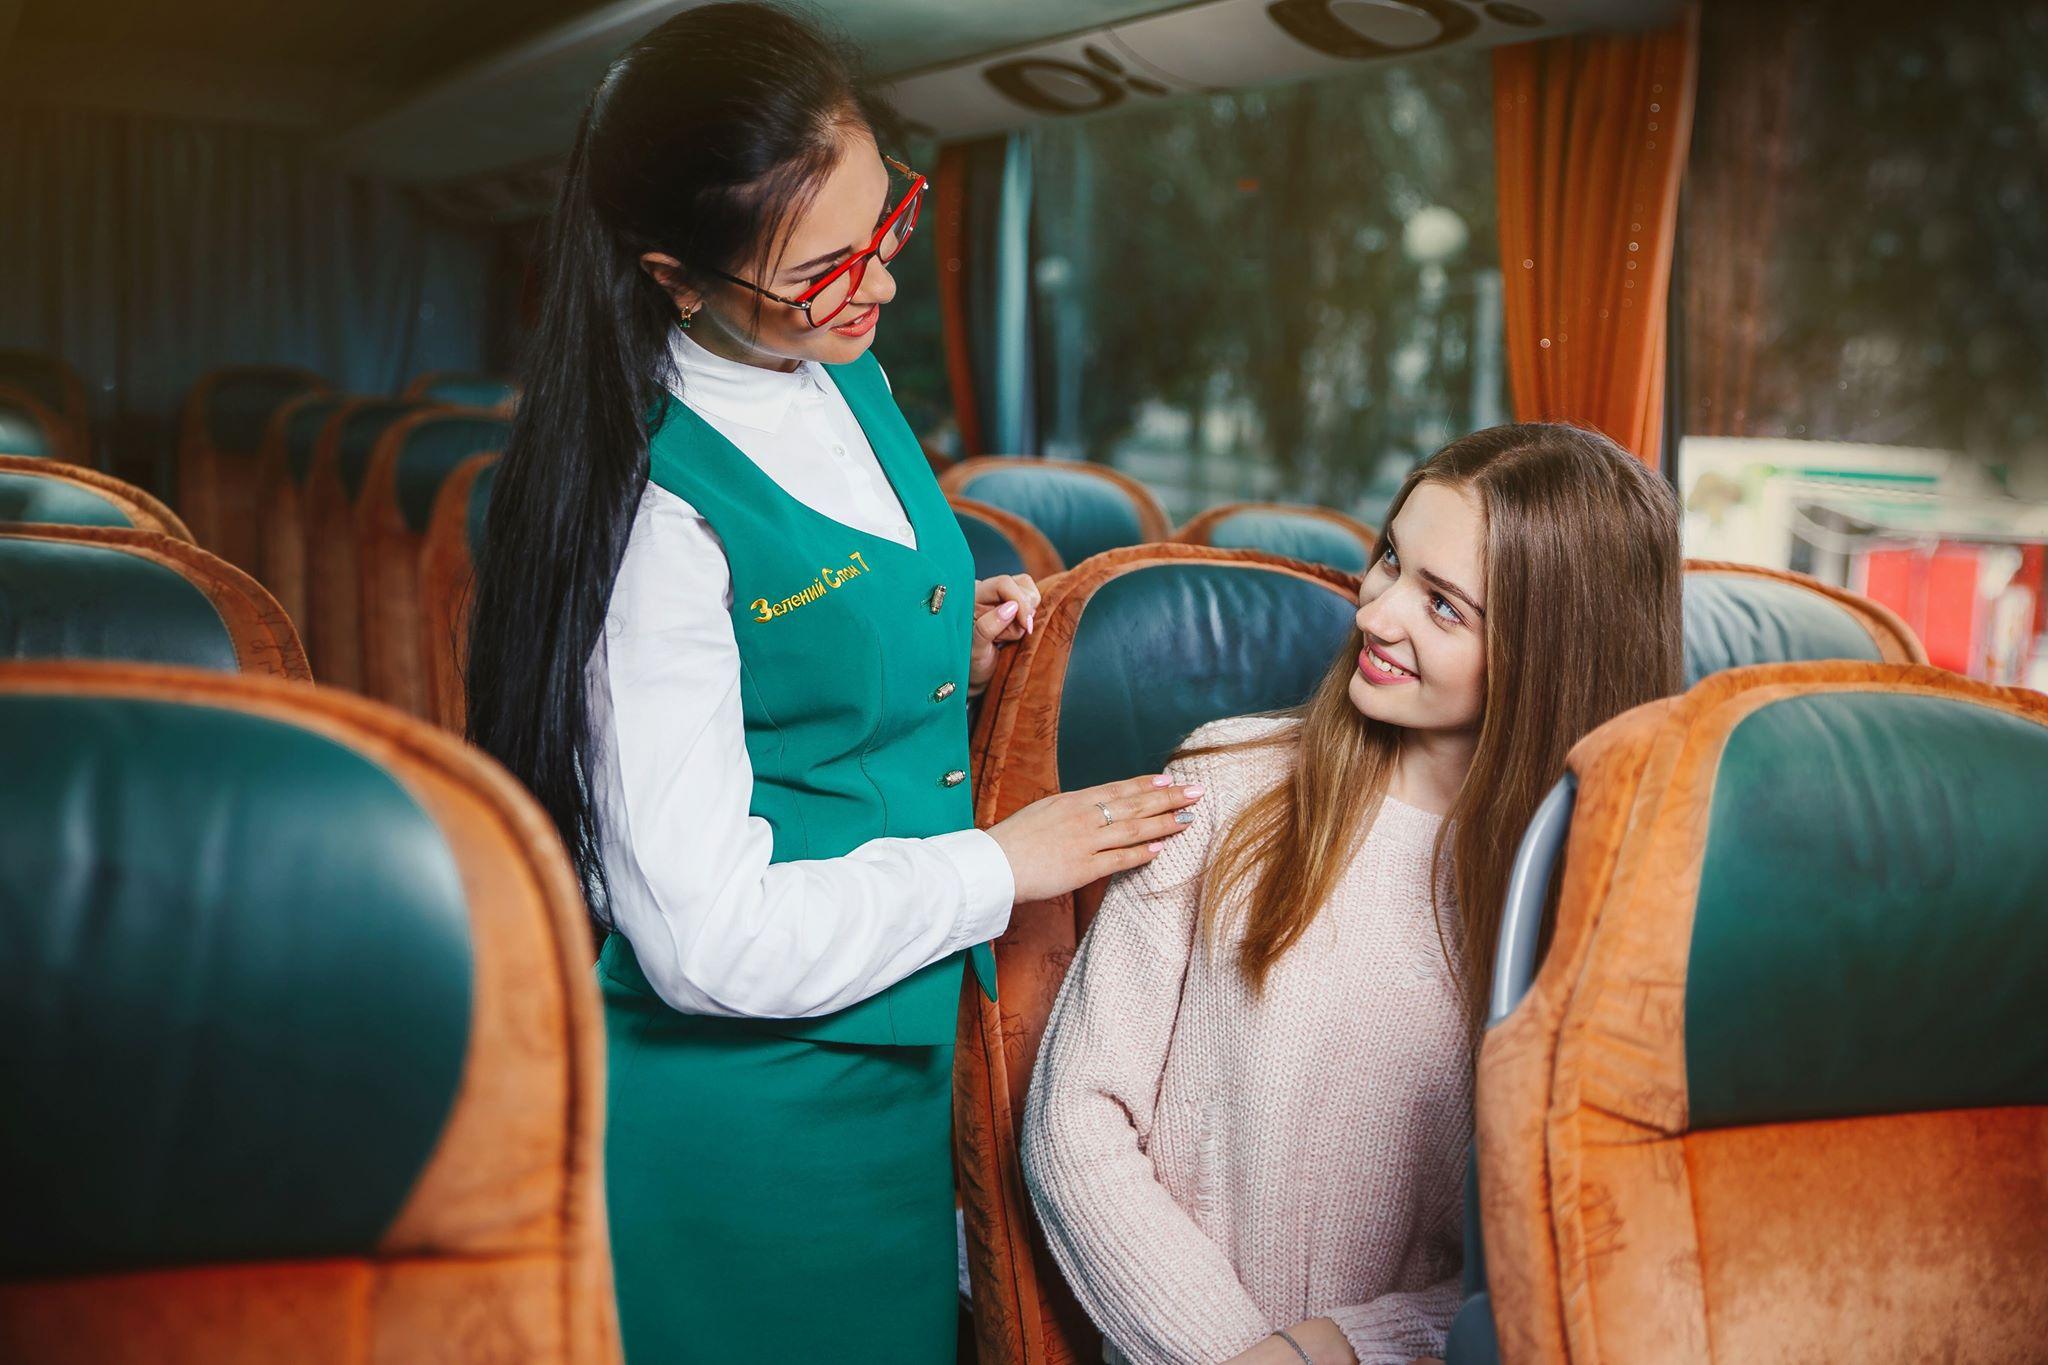 Переваги покупки квитка на автобус онлайн